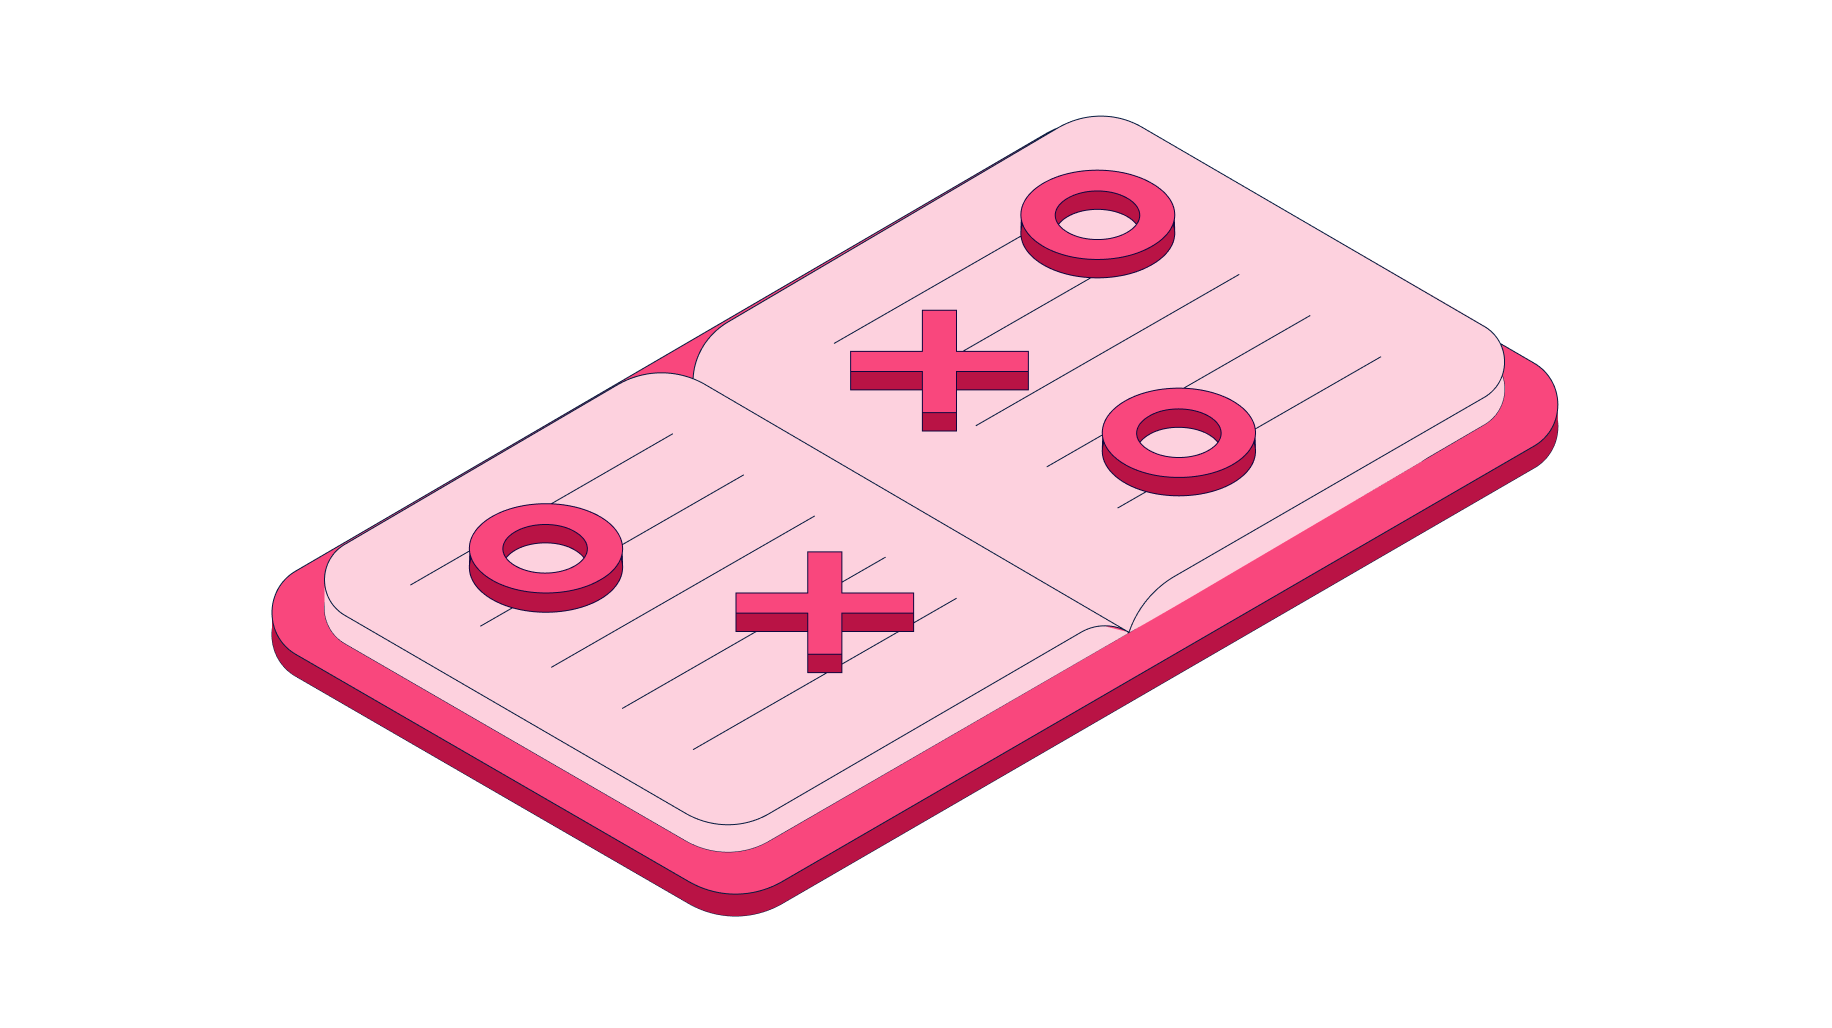 open playbook illustration